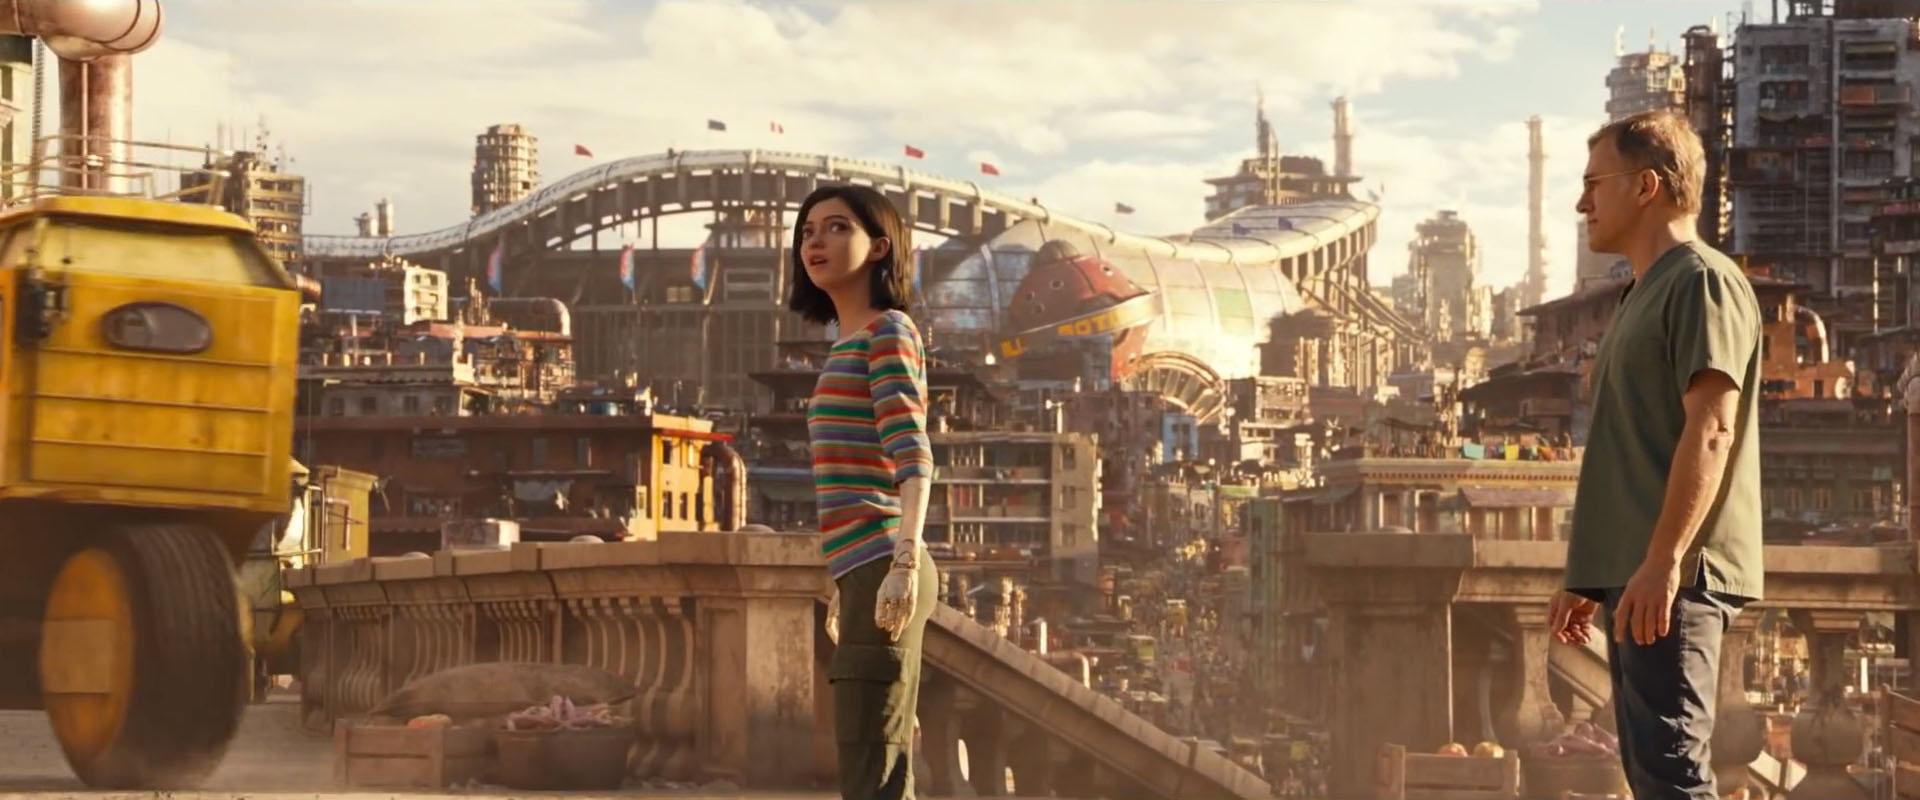 Alita Battle Angel Trailer Finally Gives Us A Look At